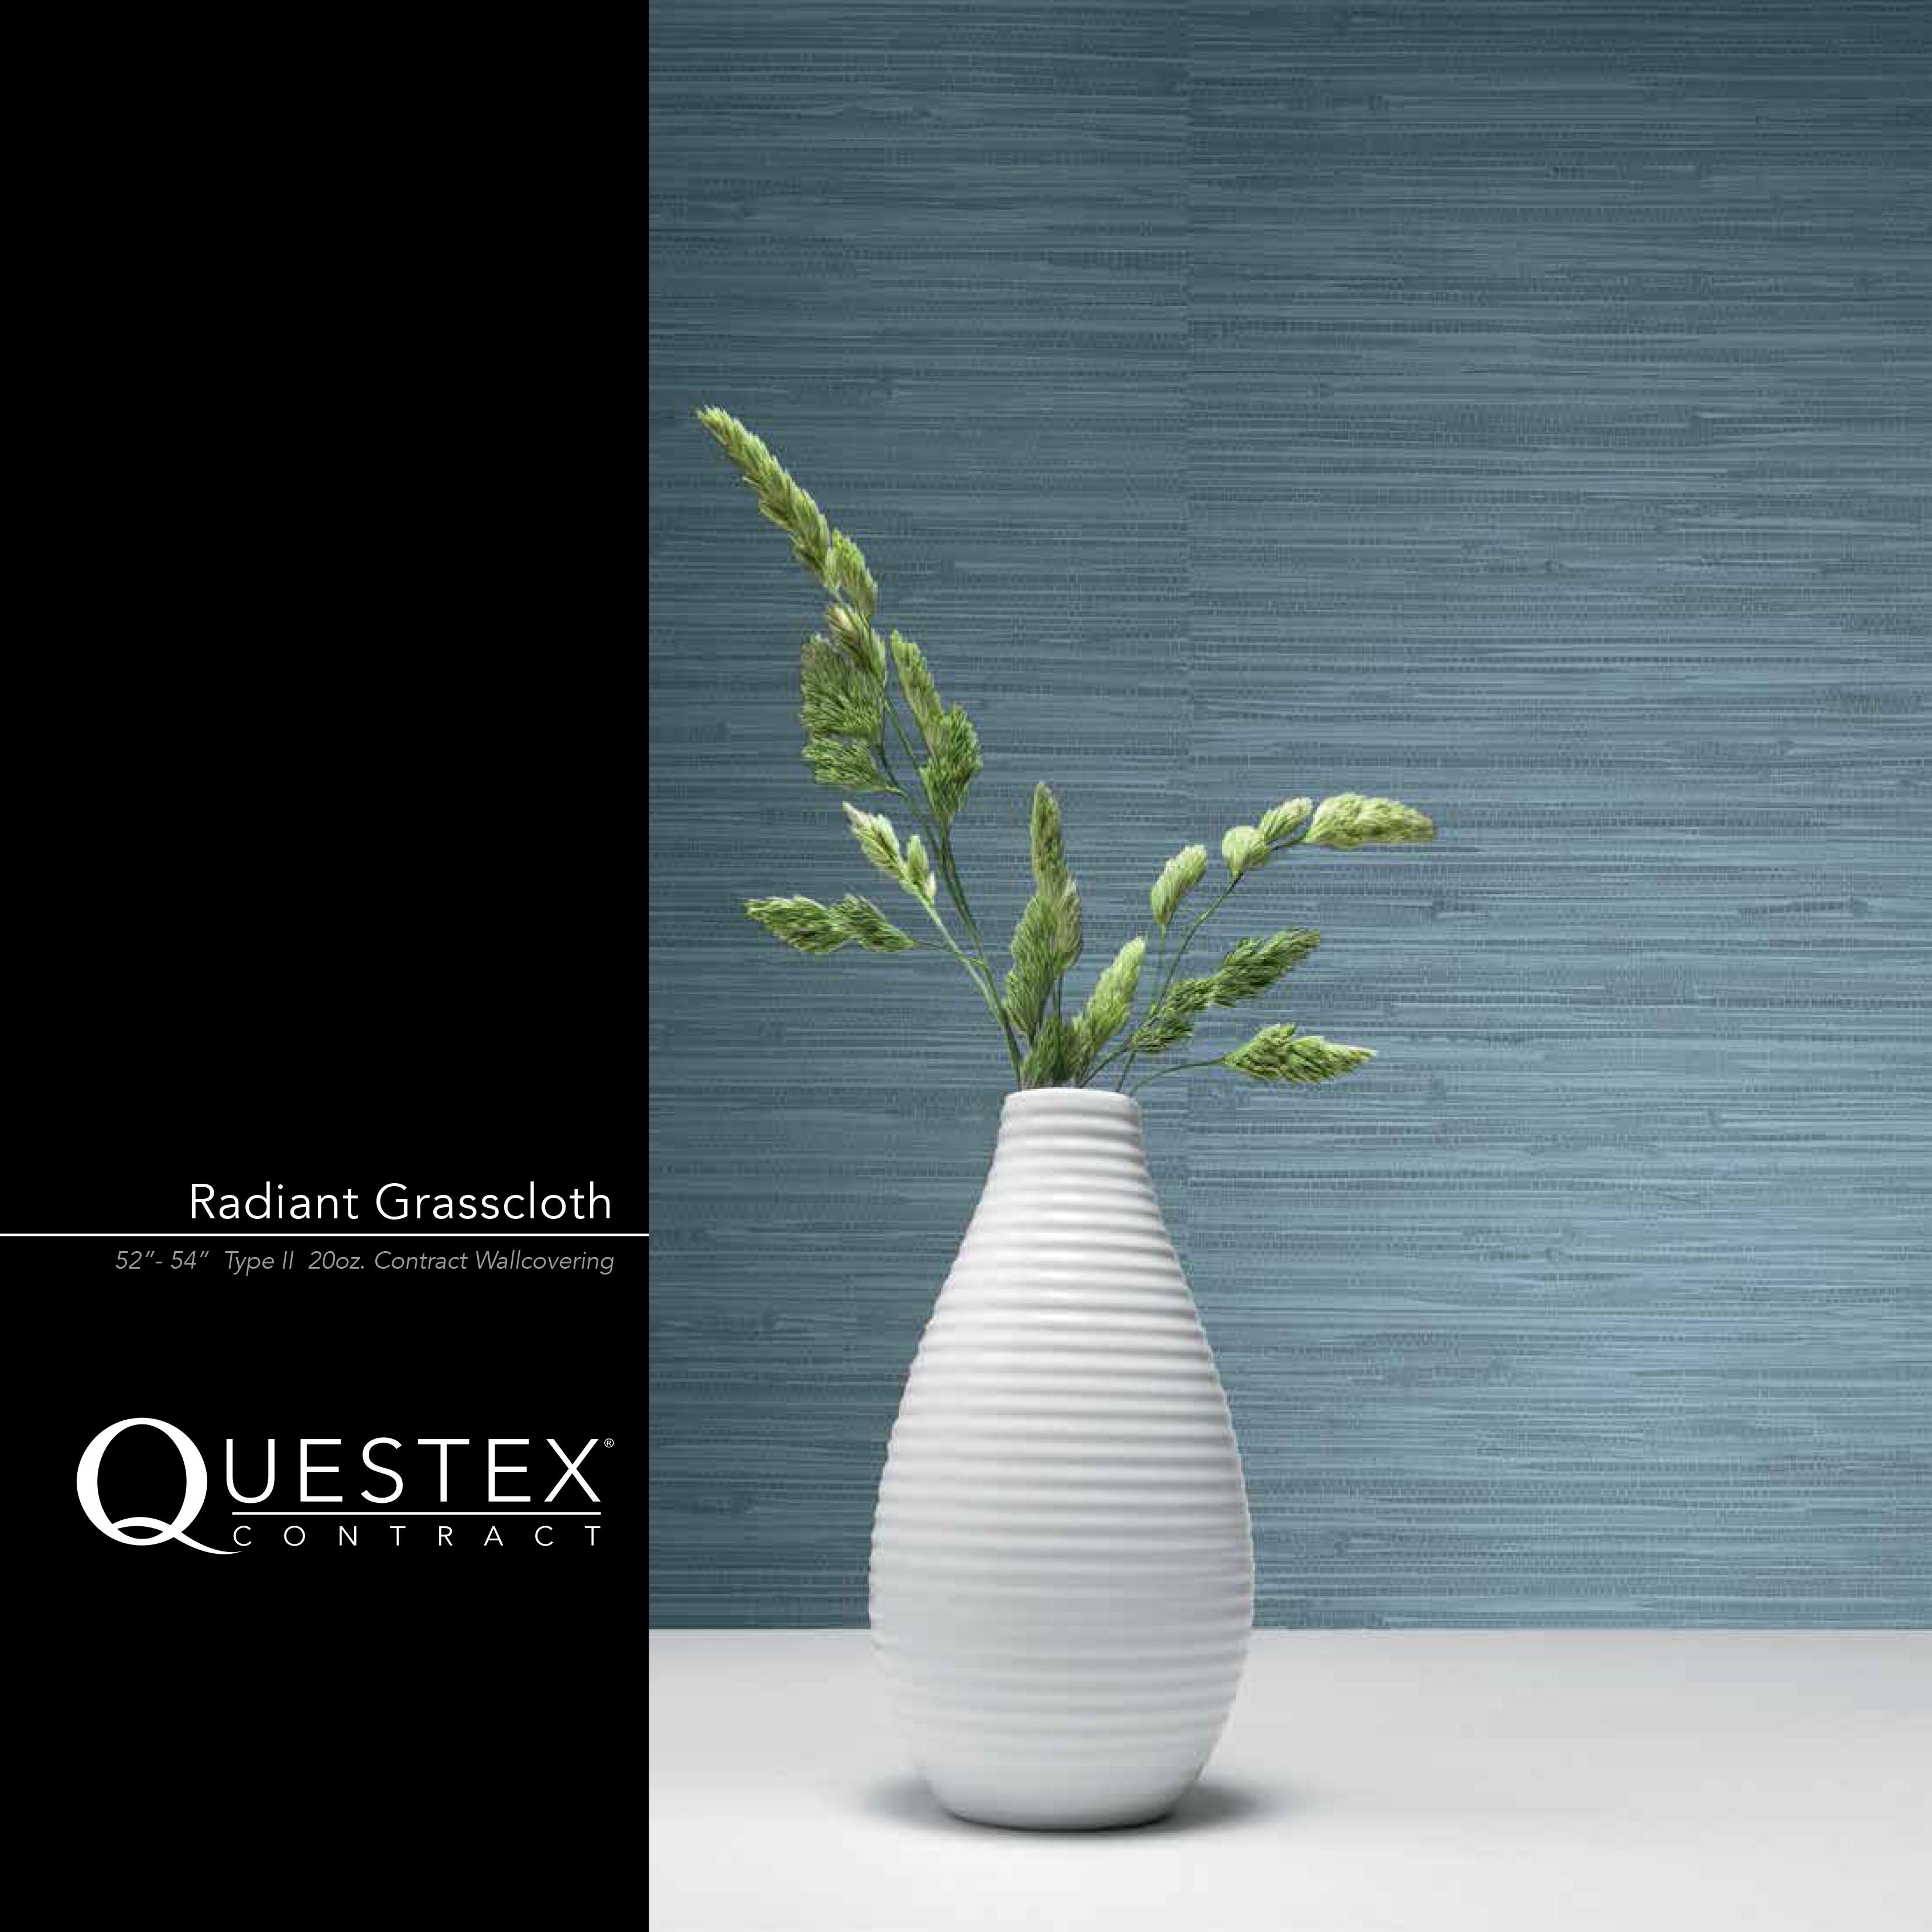 Radiant_grasscloth